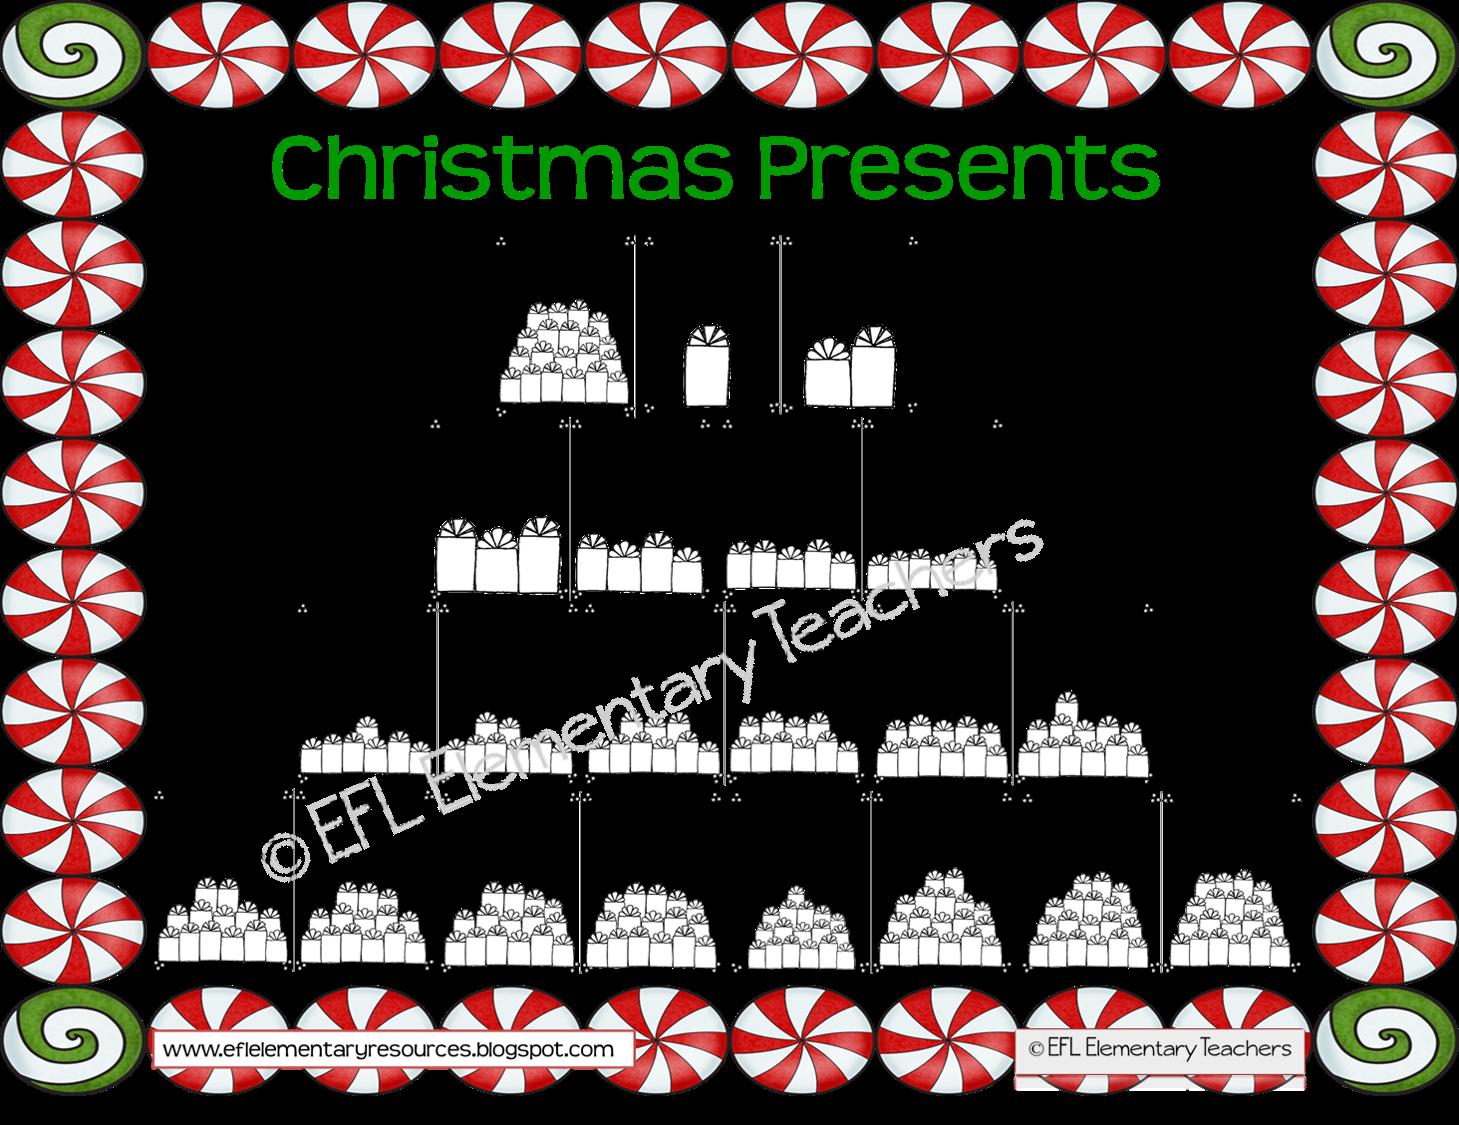 Efl Elementary Teachers Christmas Resources For Esl Efl Ell